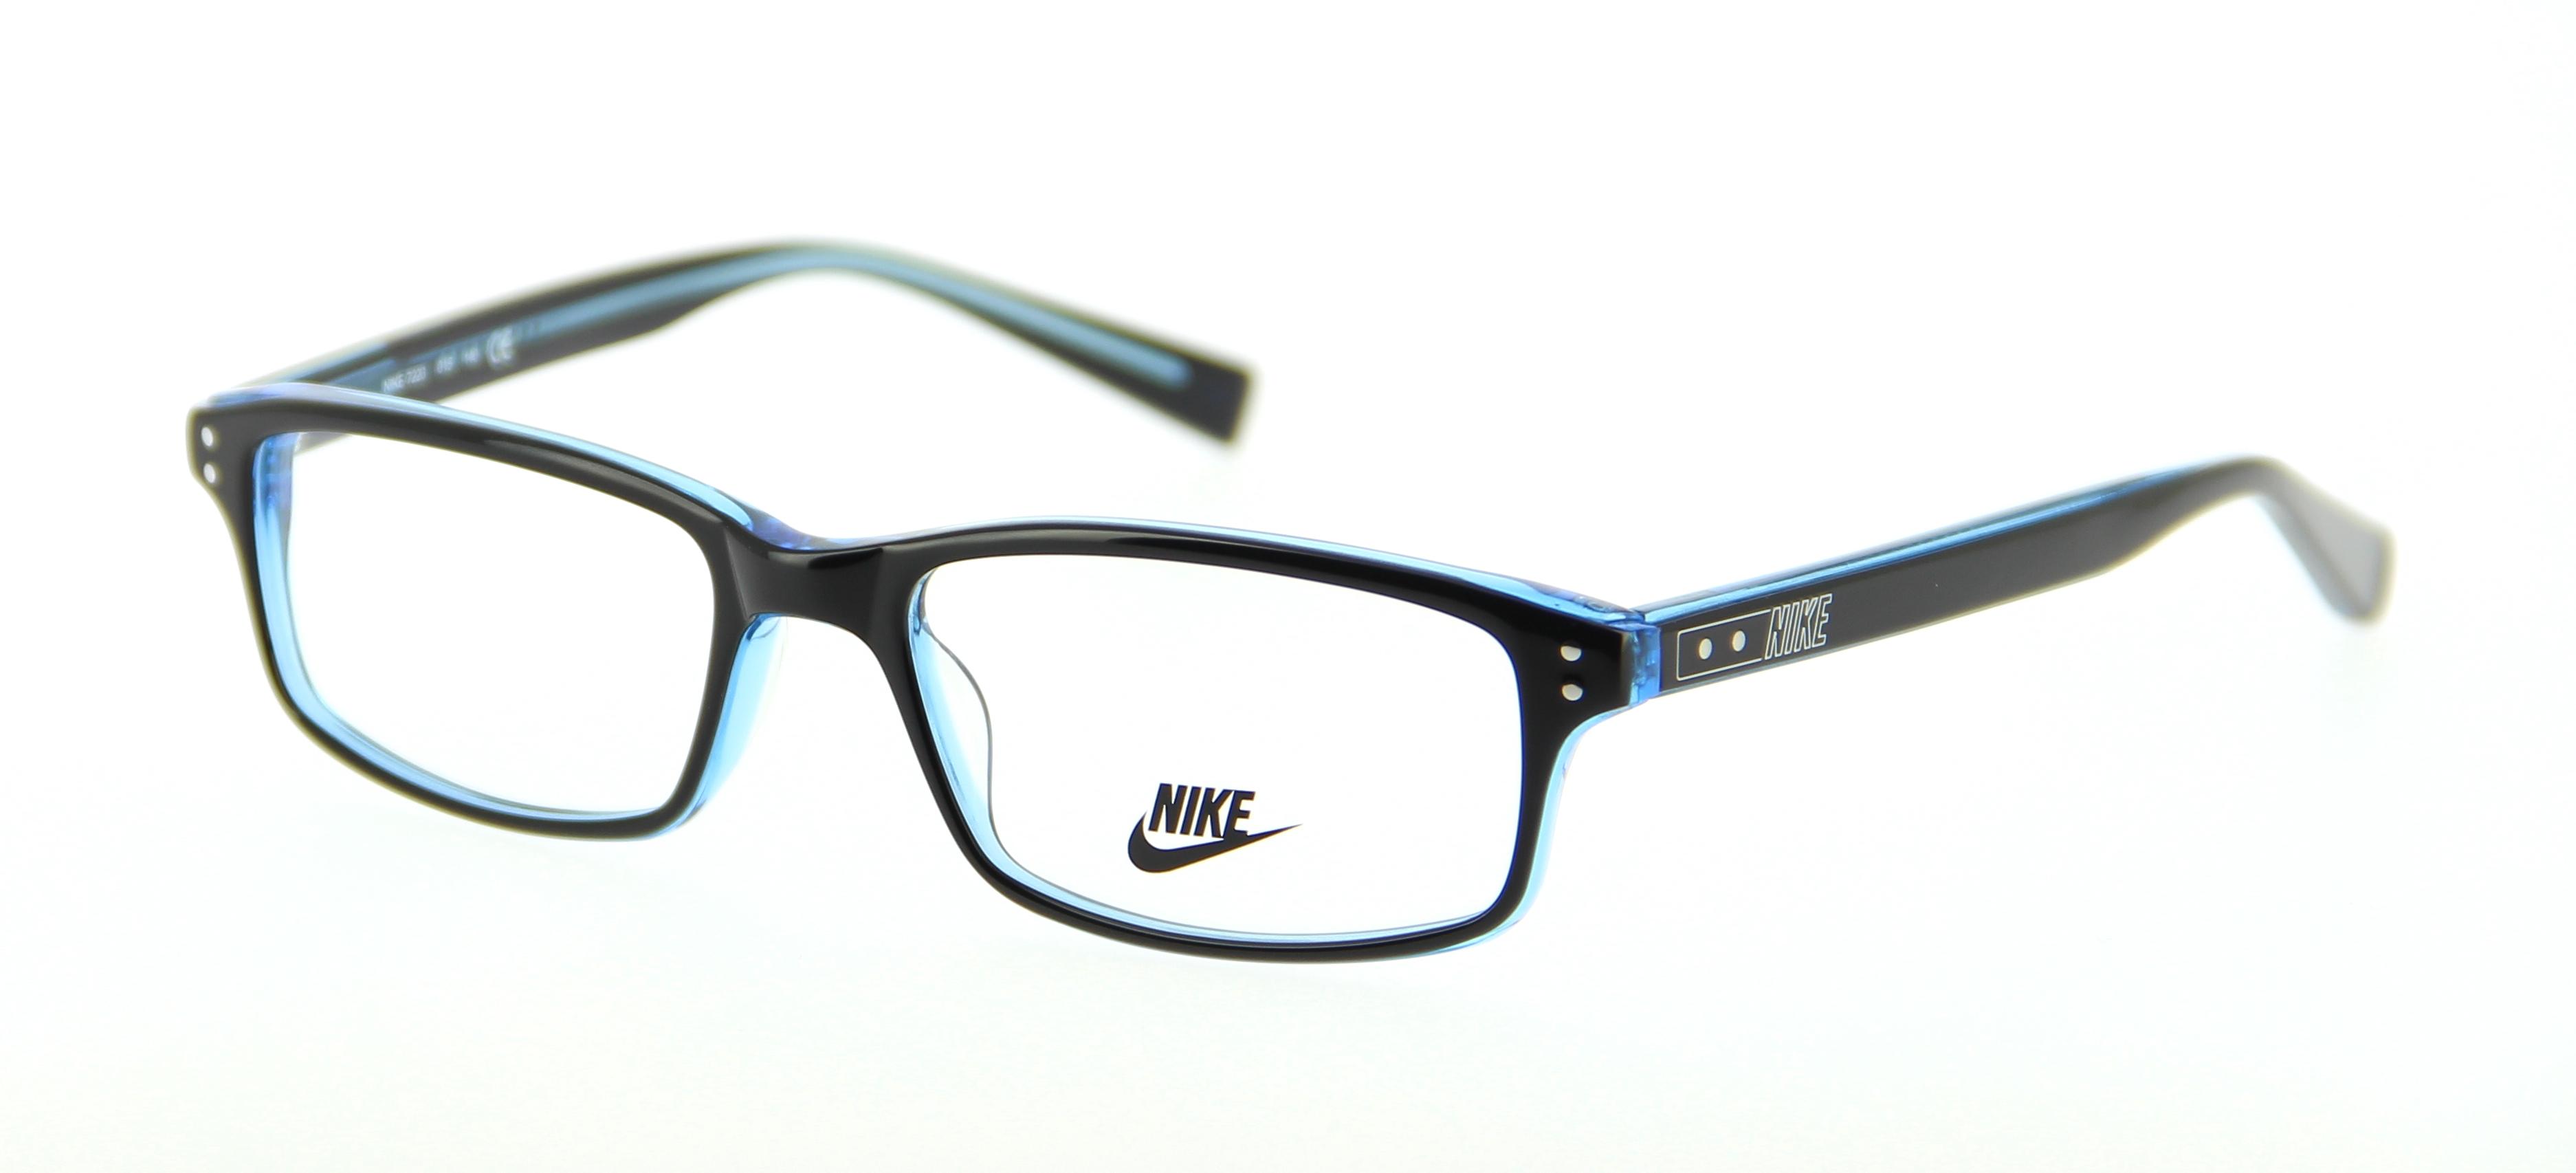 Nike 7223 Eyeglasses Frame : Eyeglasses NIKE 7223 015 52/17 NIKE